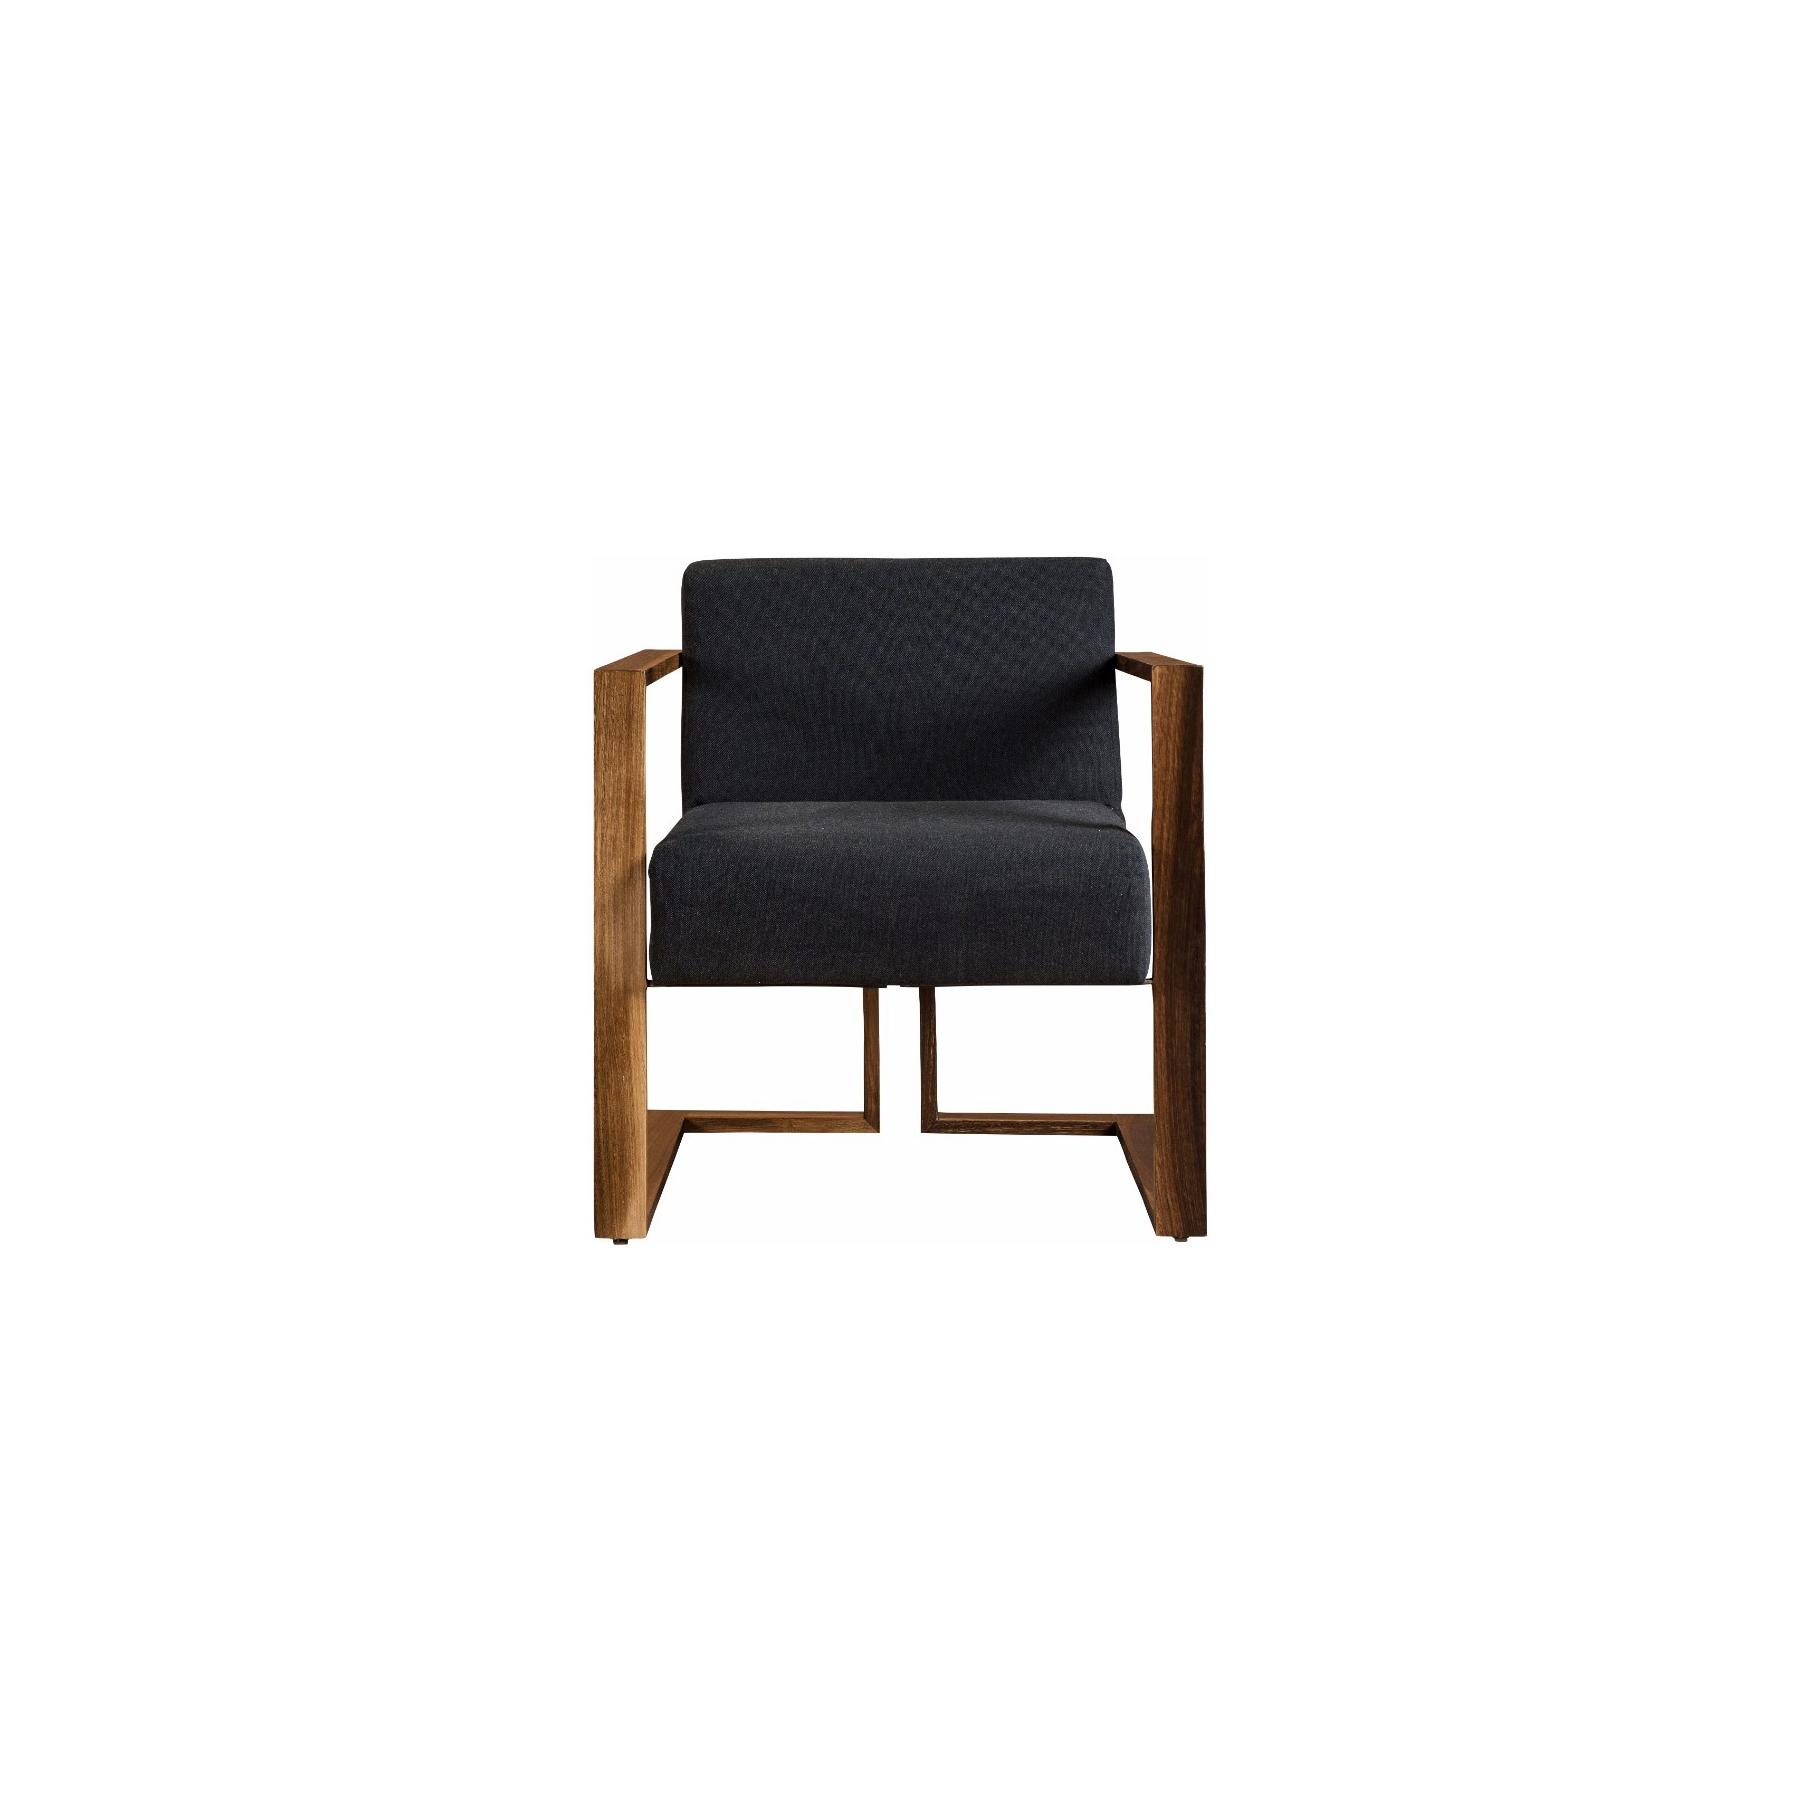 Ollin Loungechair copy.jpg